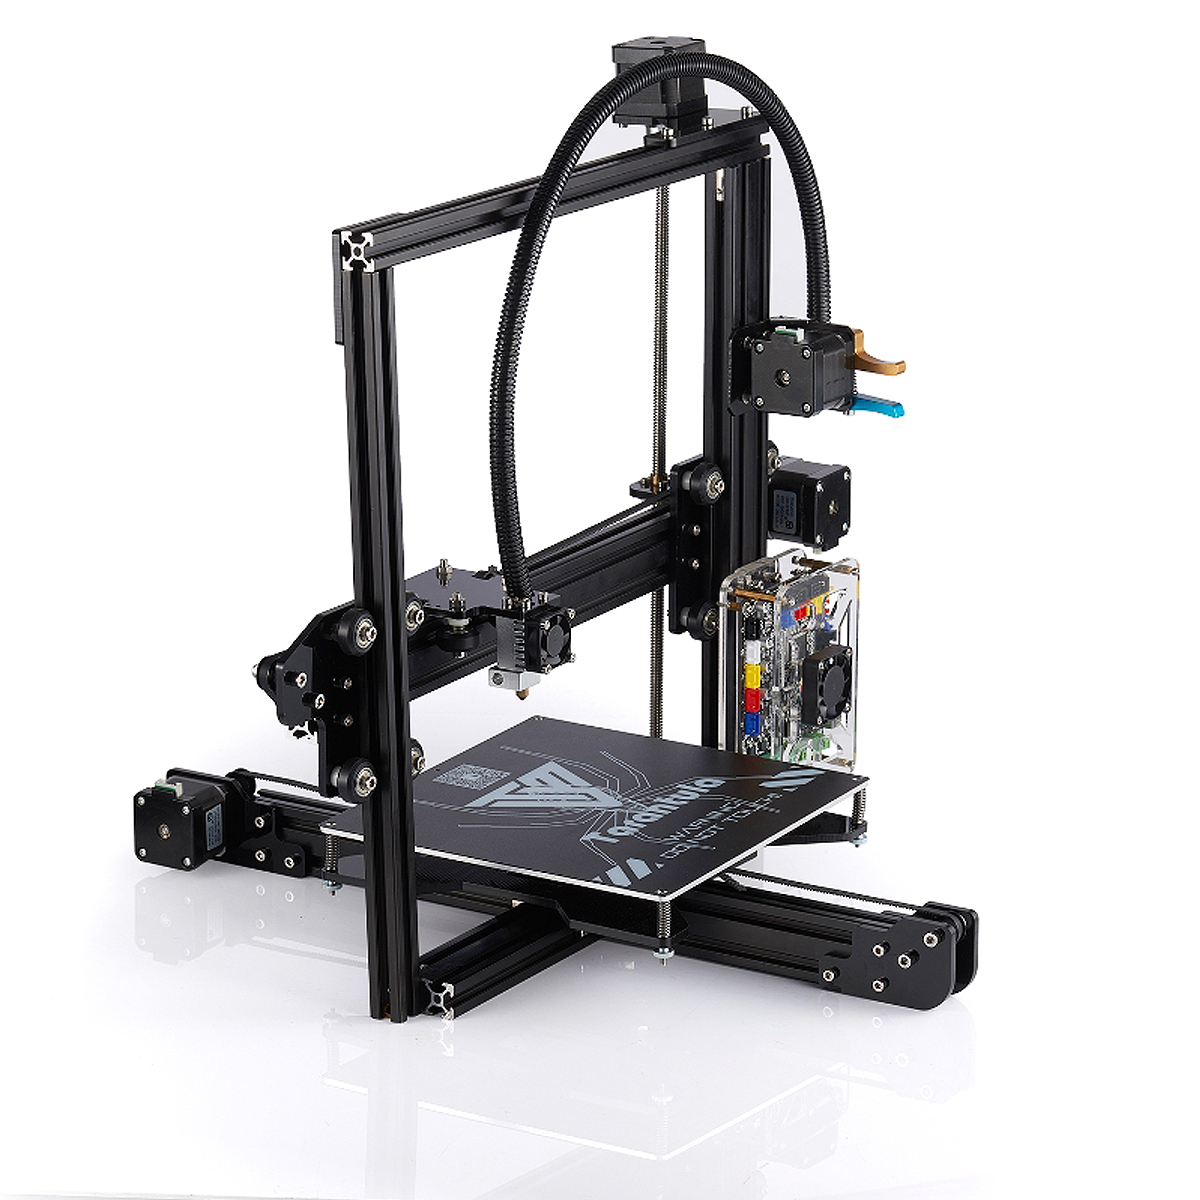 DIY 3D Printer Kit 0.4mm Nozzle Standard Tarantula Prusa I3 With 2 Filaments US